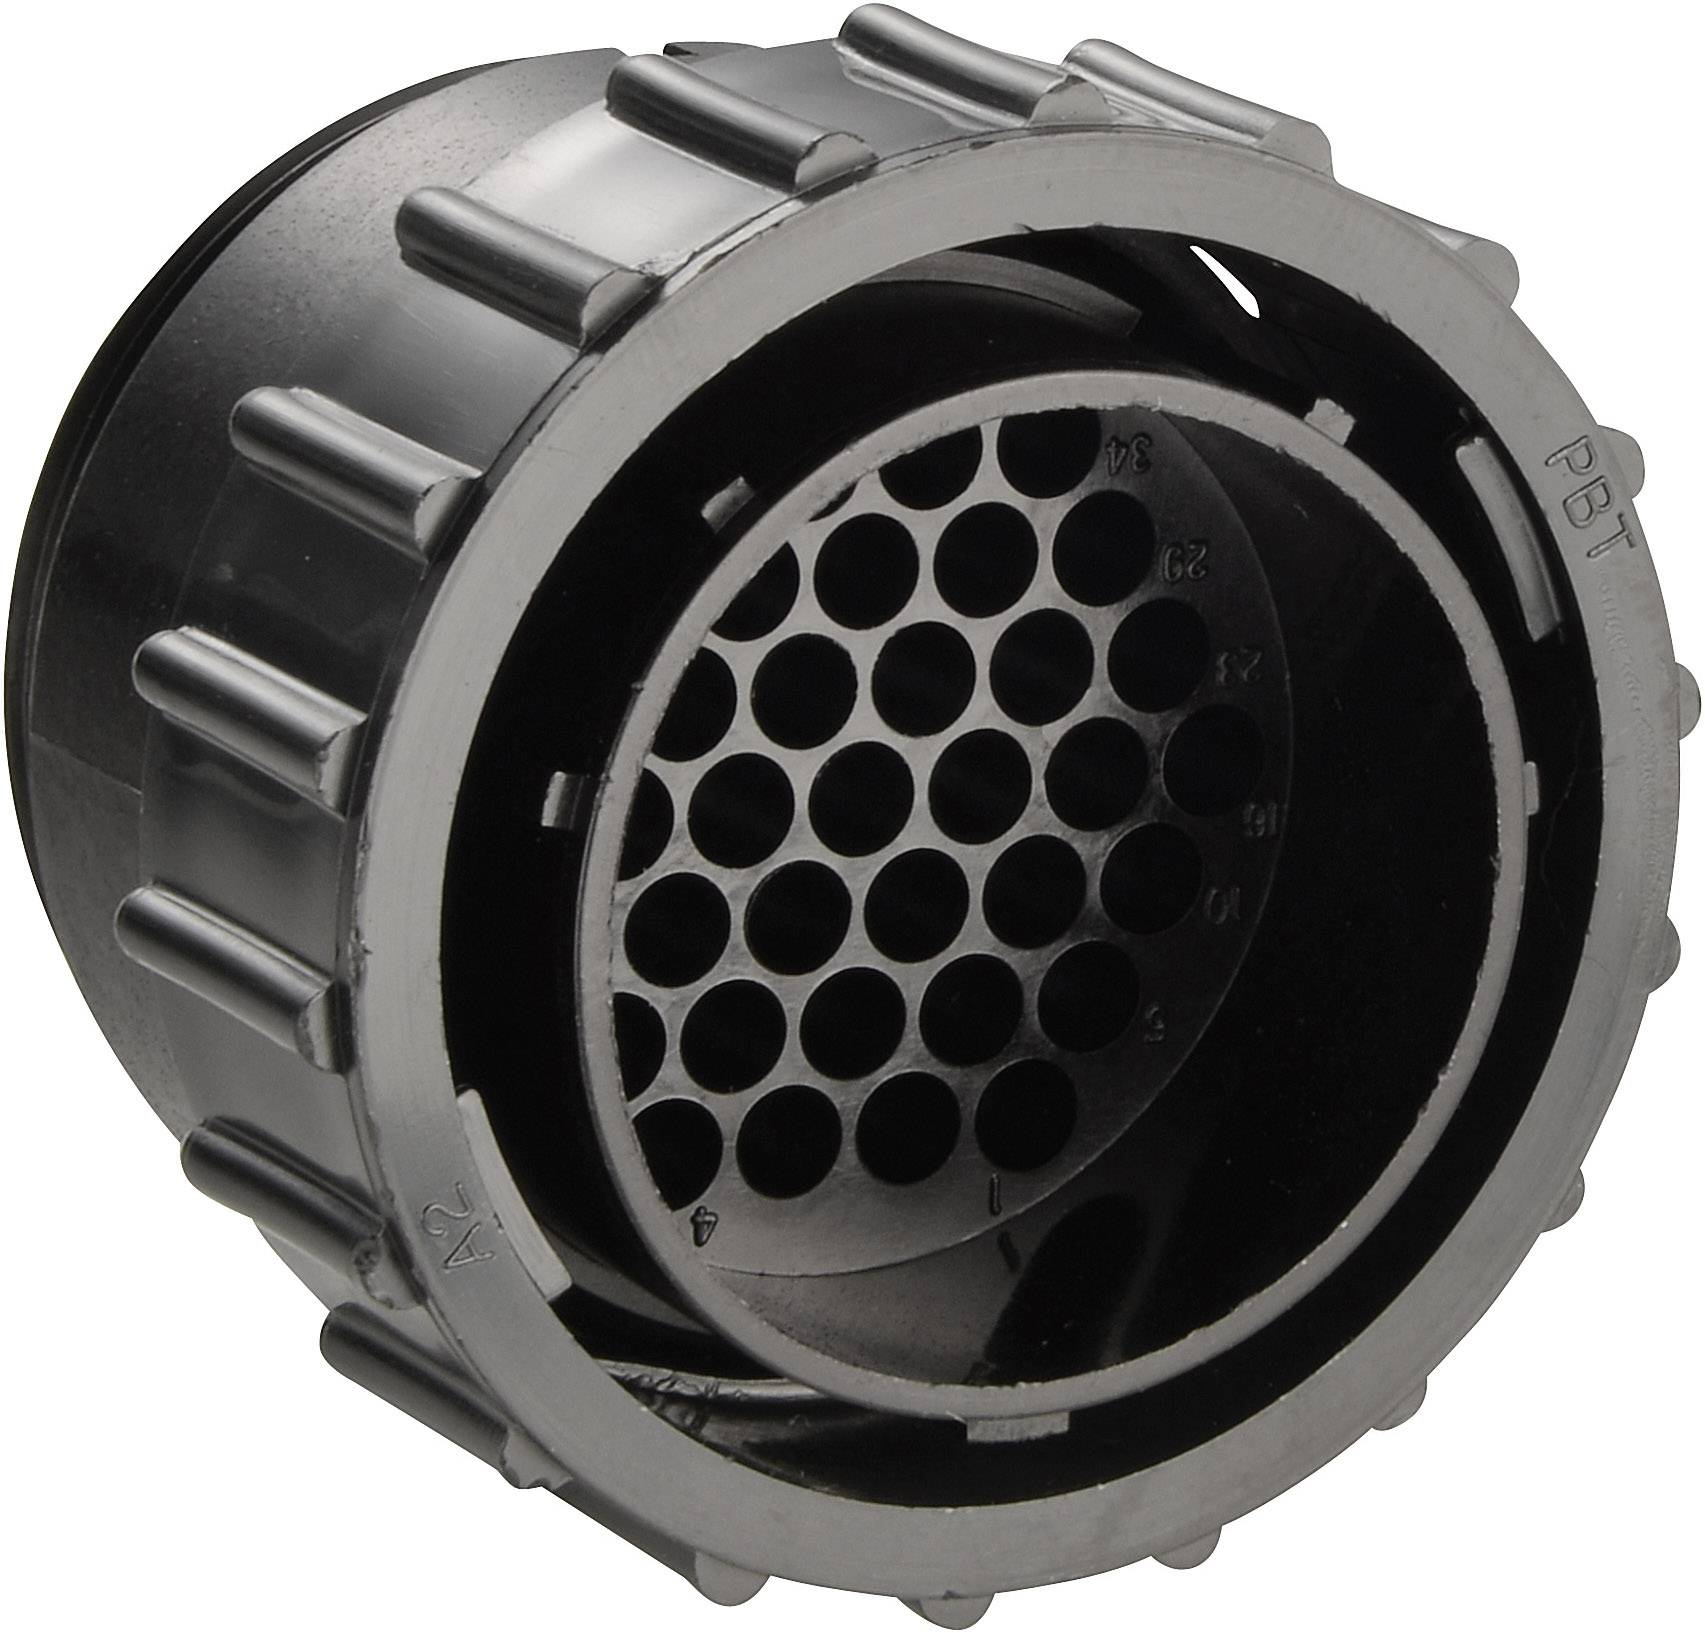 CPC, Kryt pro kontakt S MAT.III+0,20-0,56mm2,24-20AWG